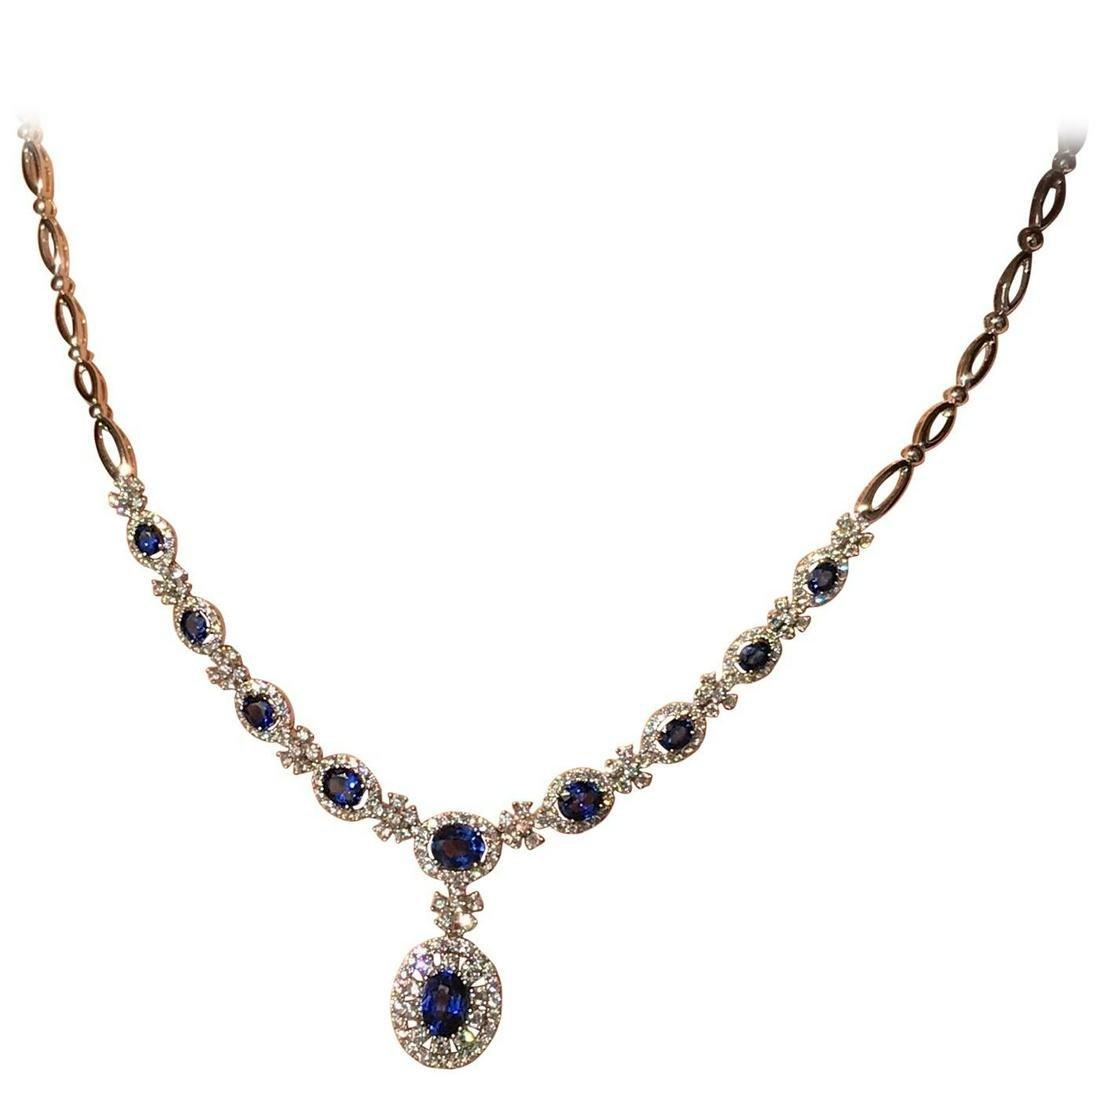 Impressive Blue Sapphire and White Diamond Royal